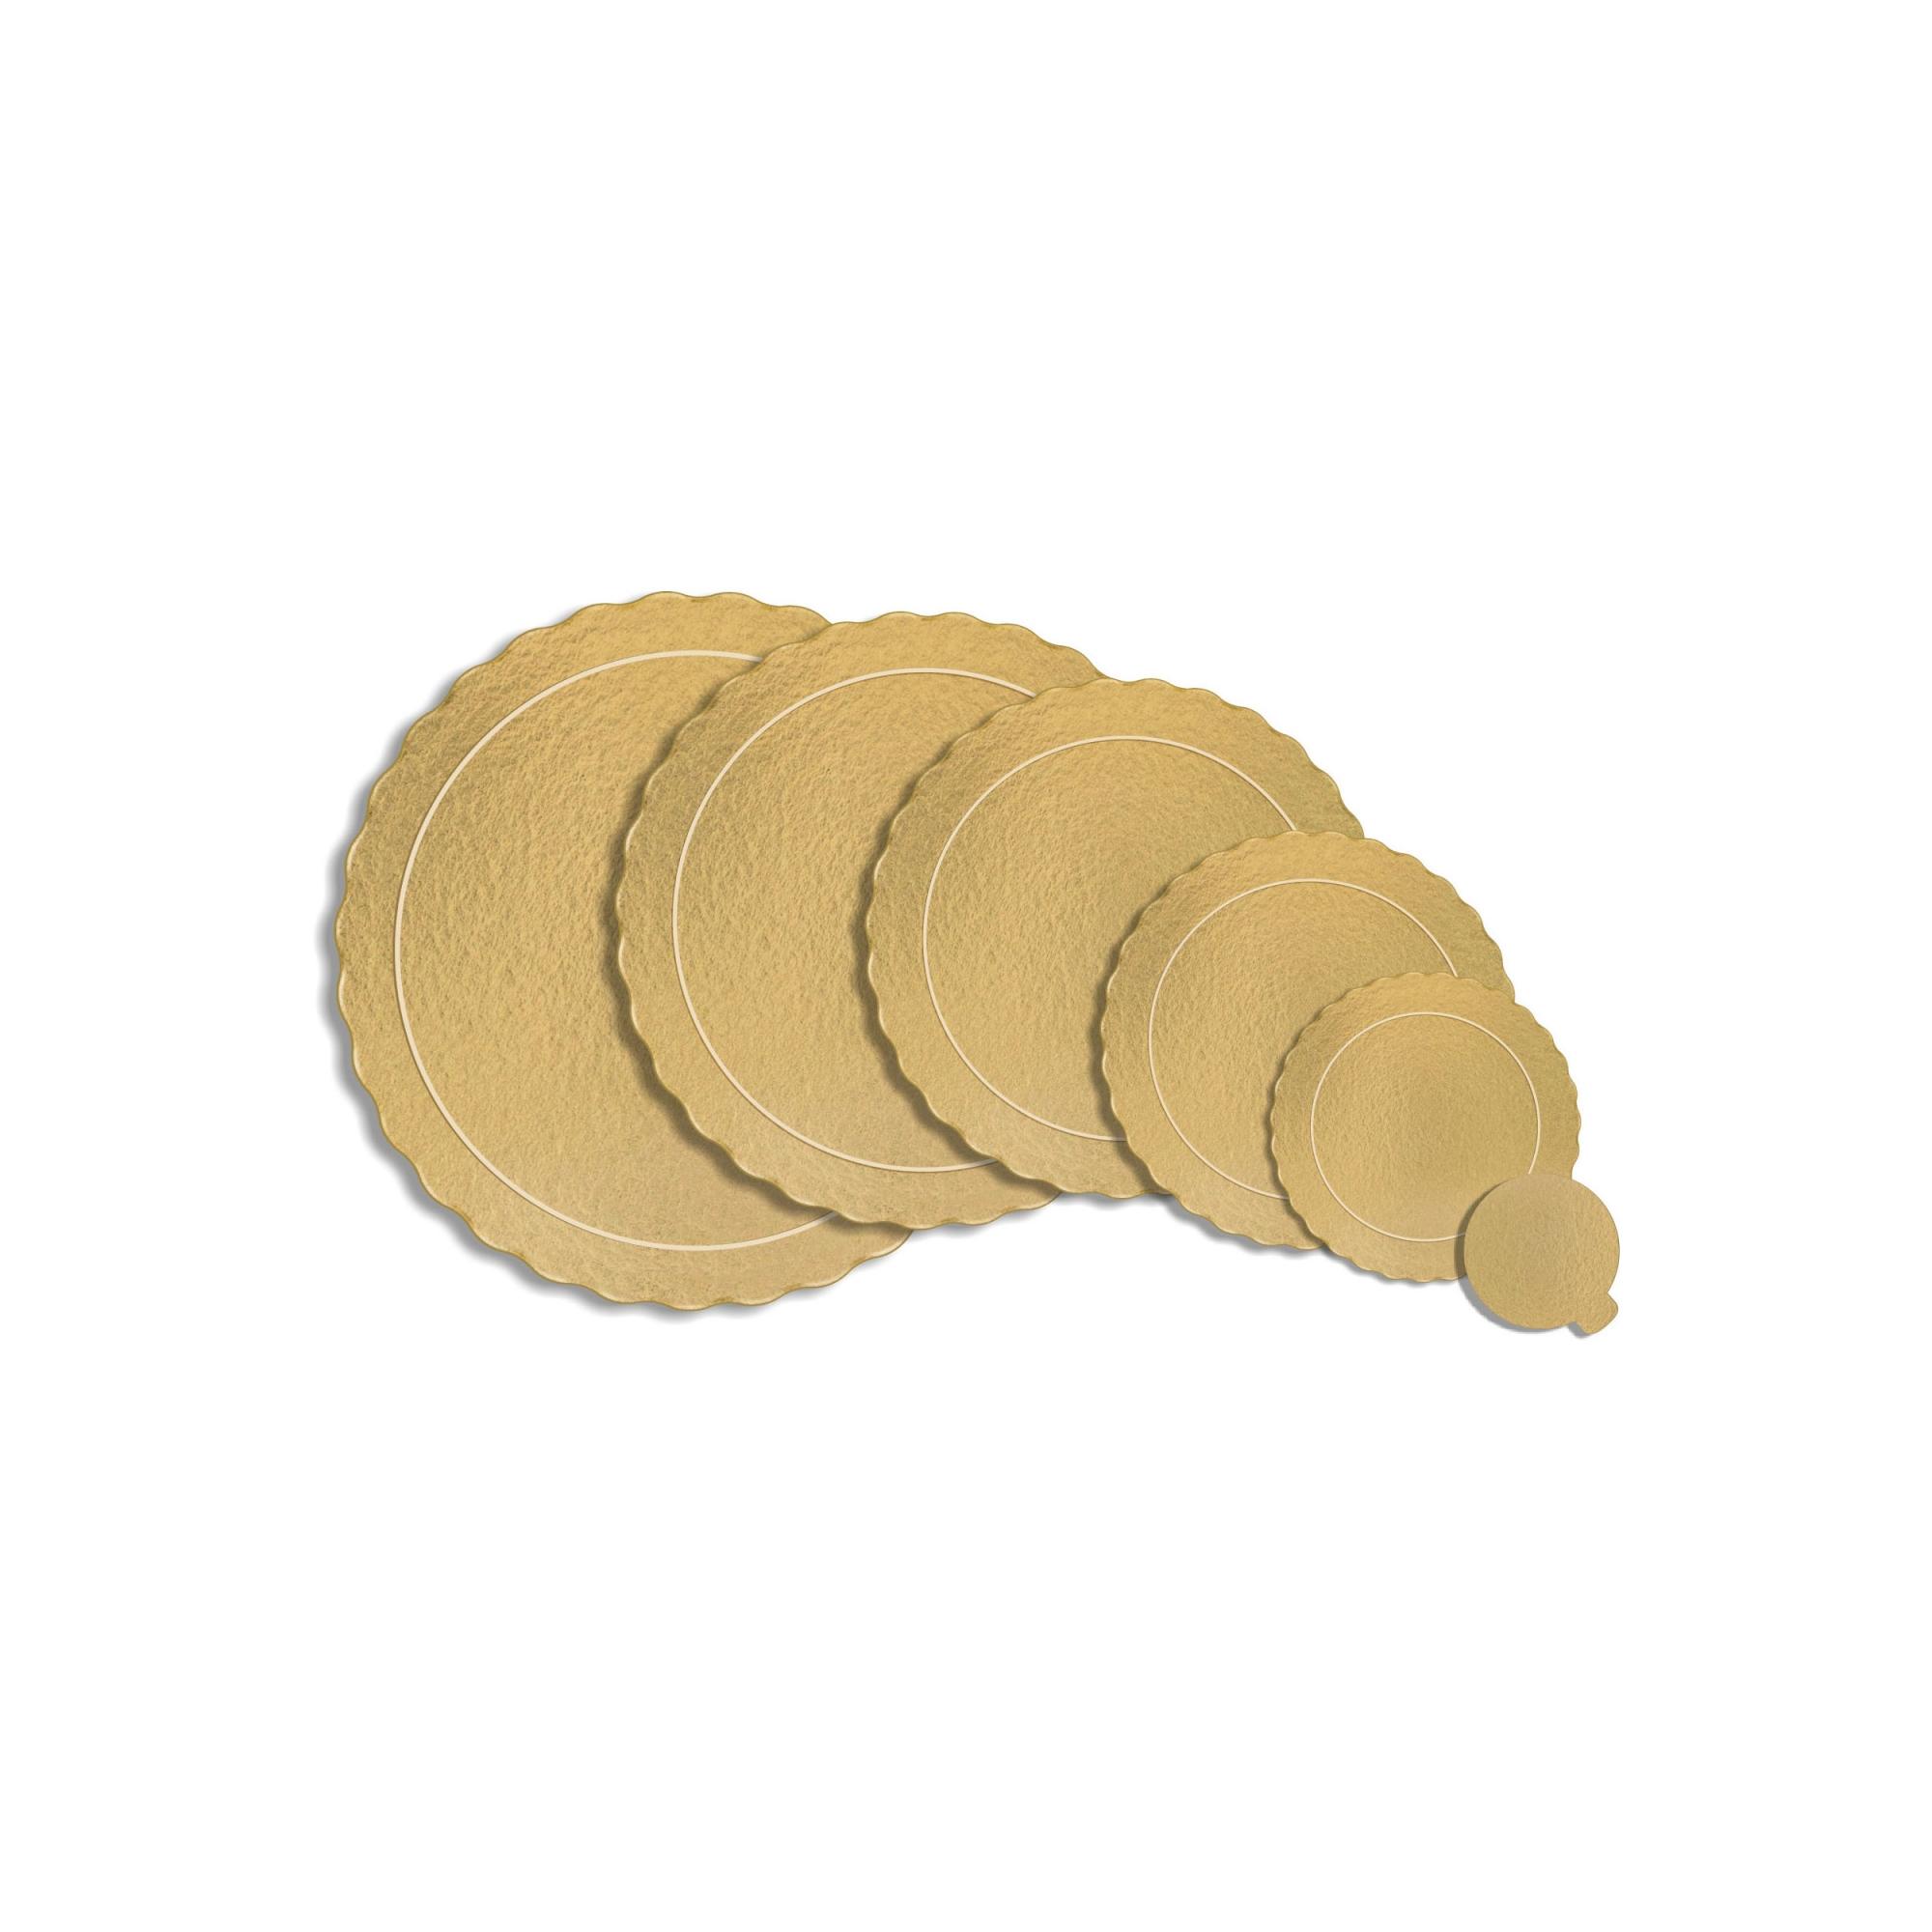 60 Bases Laminadas, Suporte P/ Bolo, Cake Board, Kit 23 e 28cm - Ouro